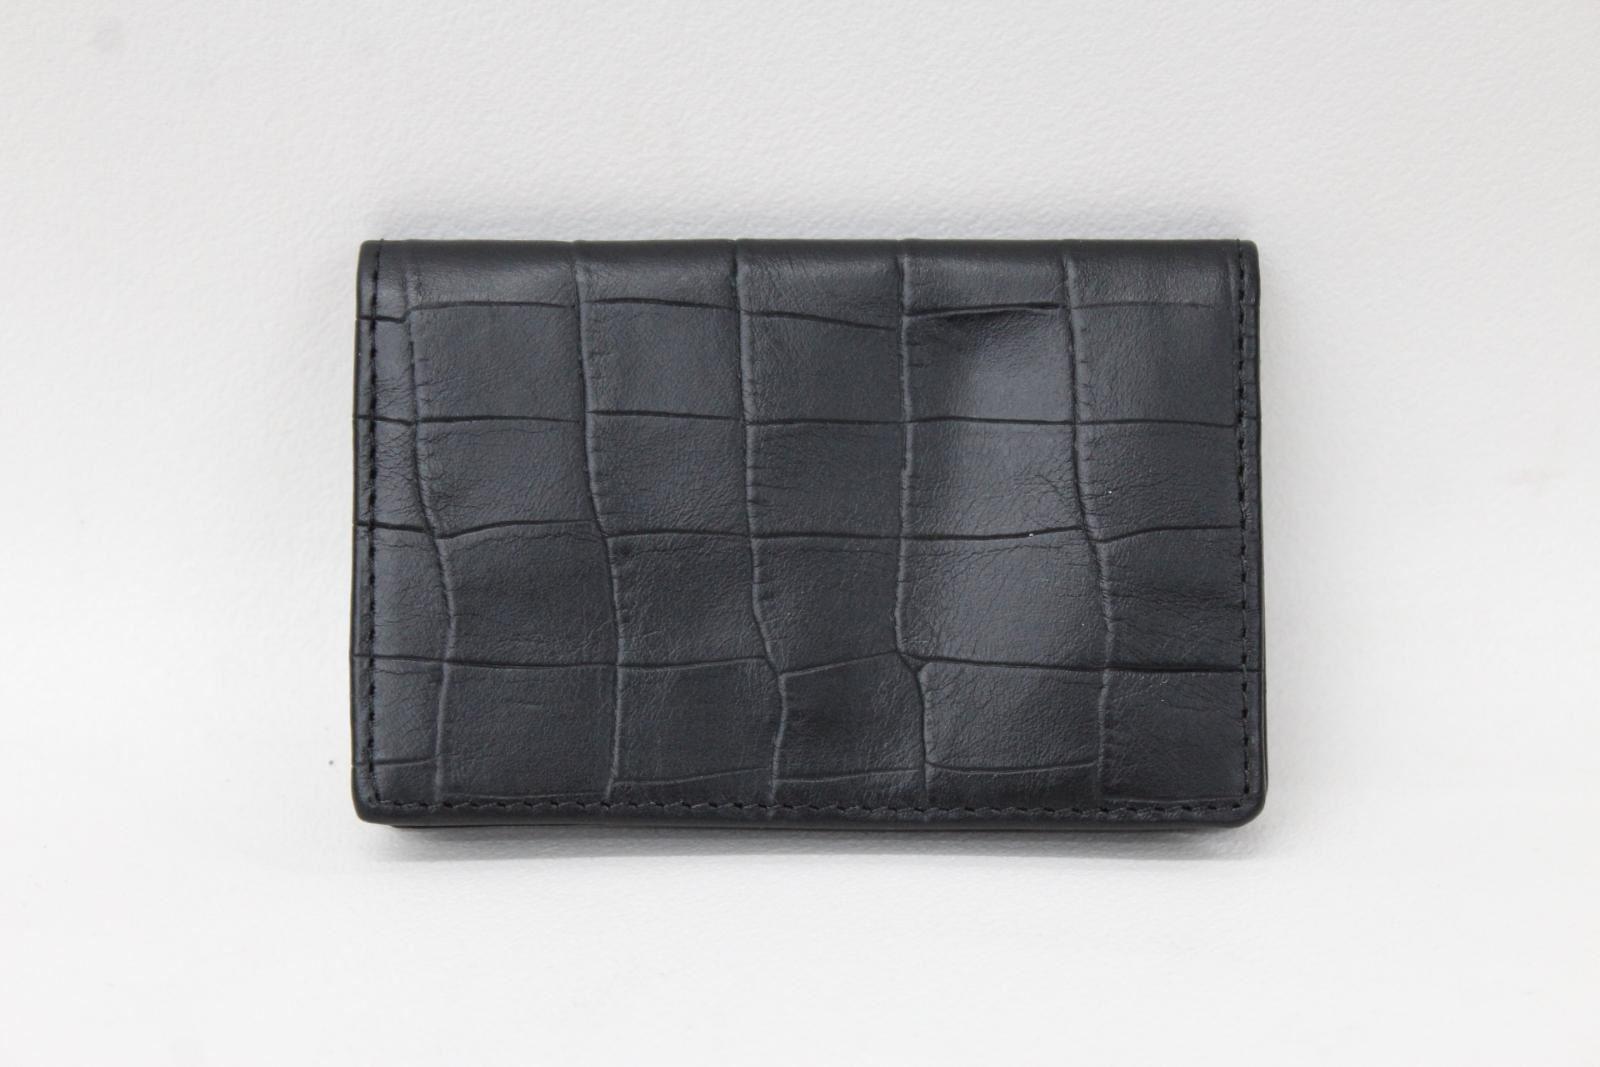 KIKI-JAMES-Men-039-s-Black-Croc-Embossed-Leather-Bifold-Card-amp-Coin-Wallet-NEW